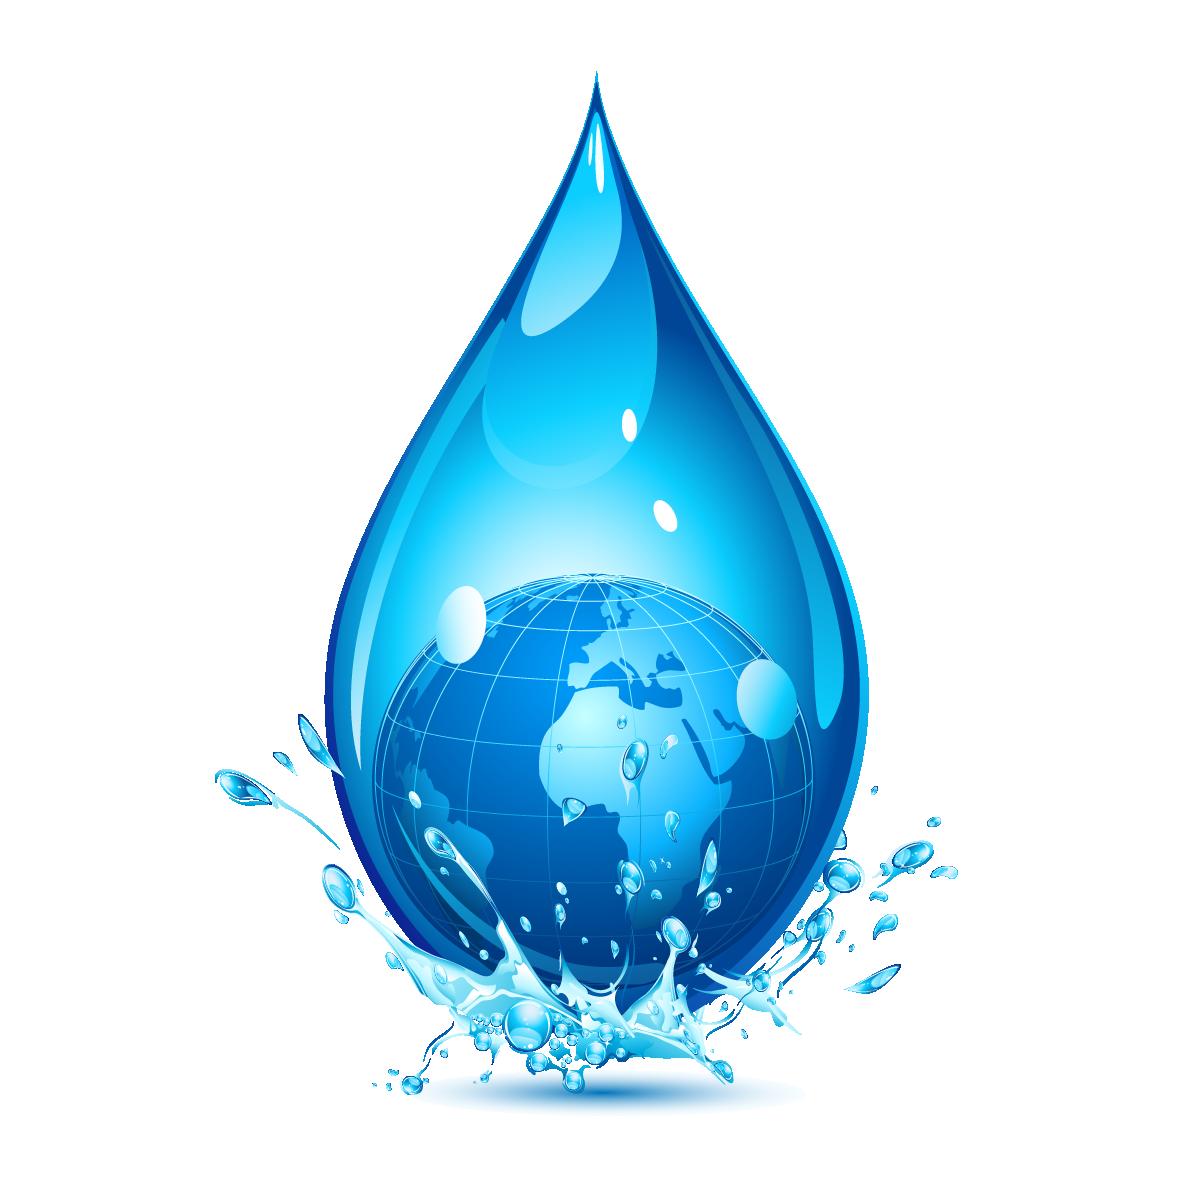 Water Drops Png Image Water Drop Images Water Drop Logo Water Drops